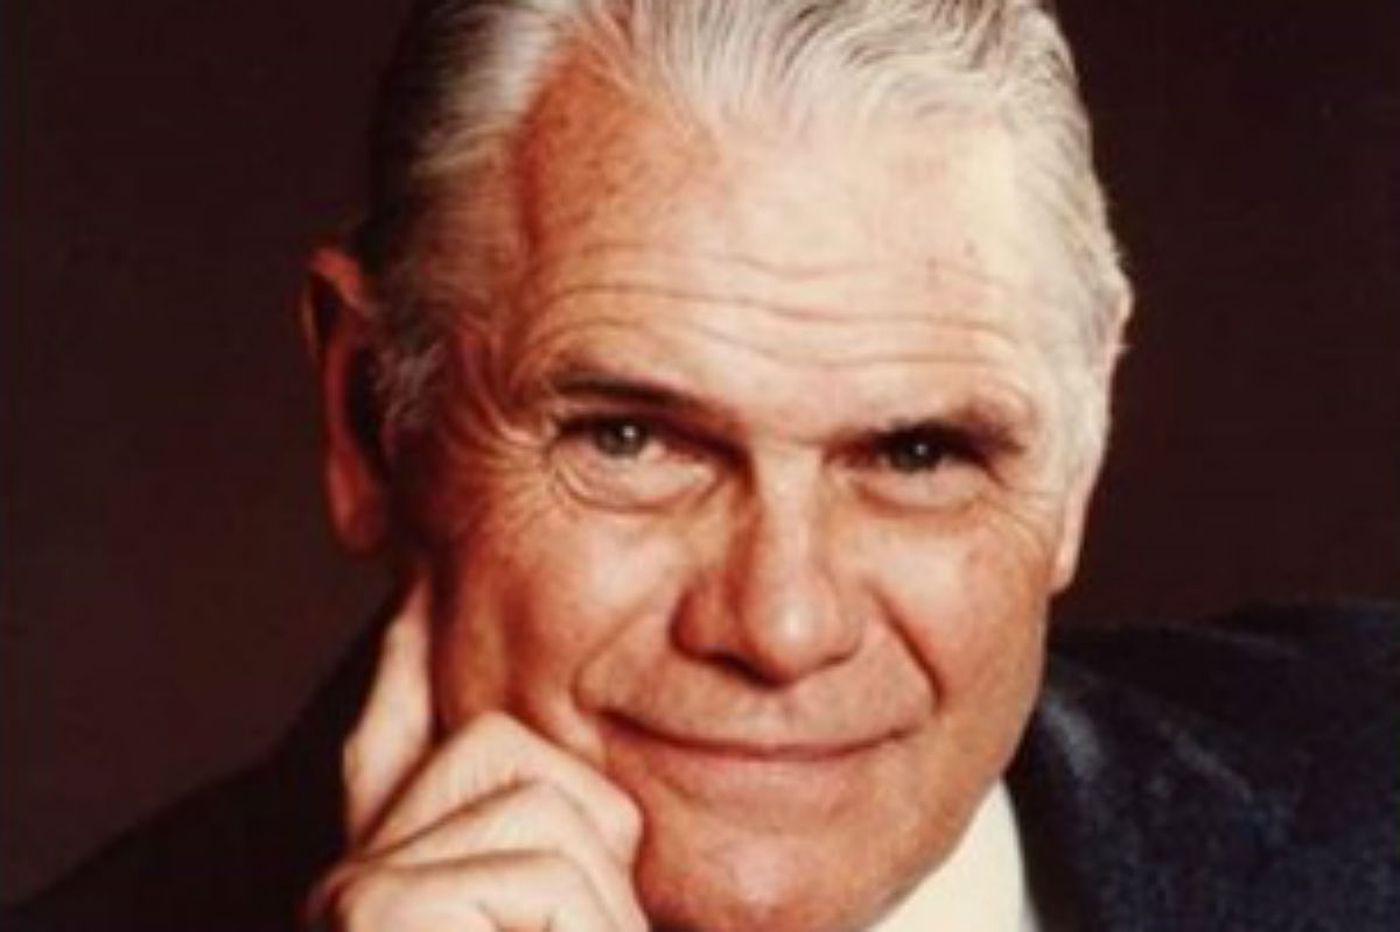 Dr. Howard H. Steel, 97, Shriners Hospital chief surgeon and orthopedic trailblazer